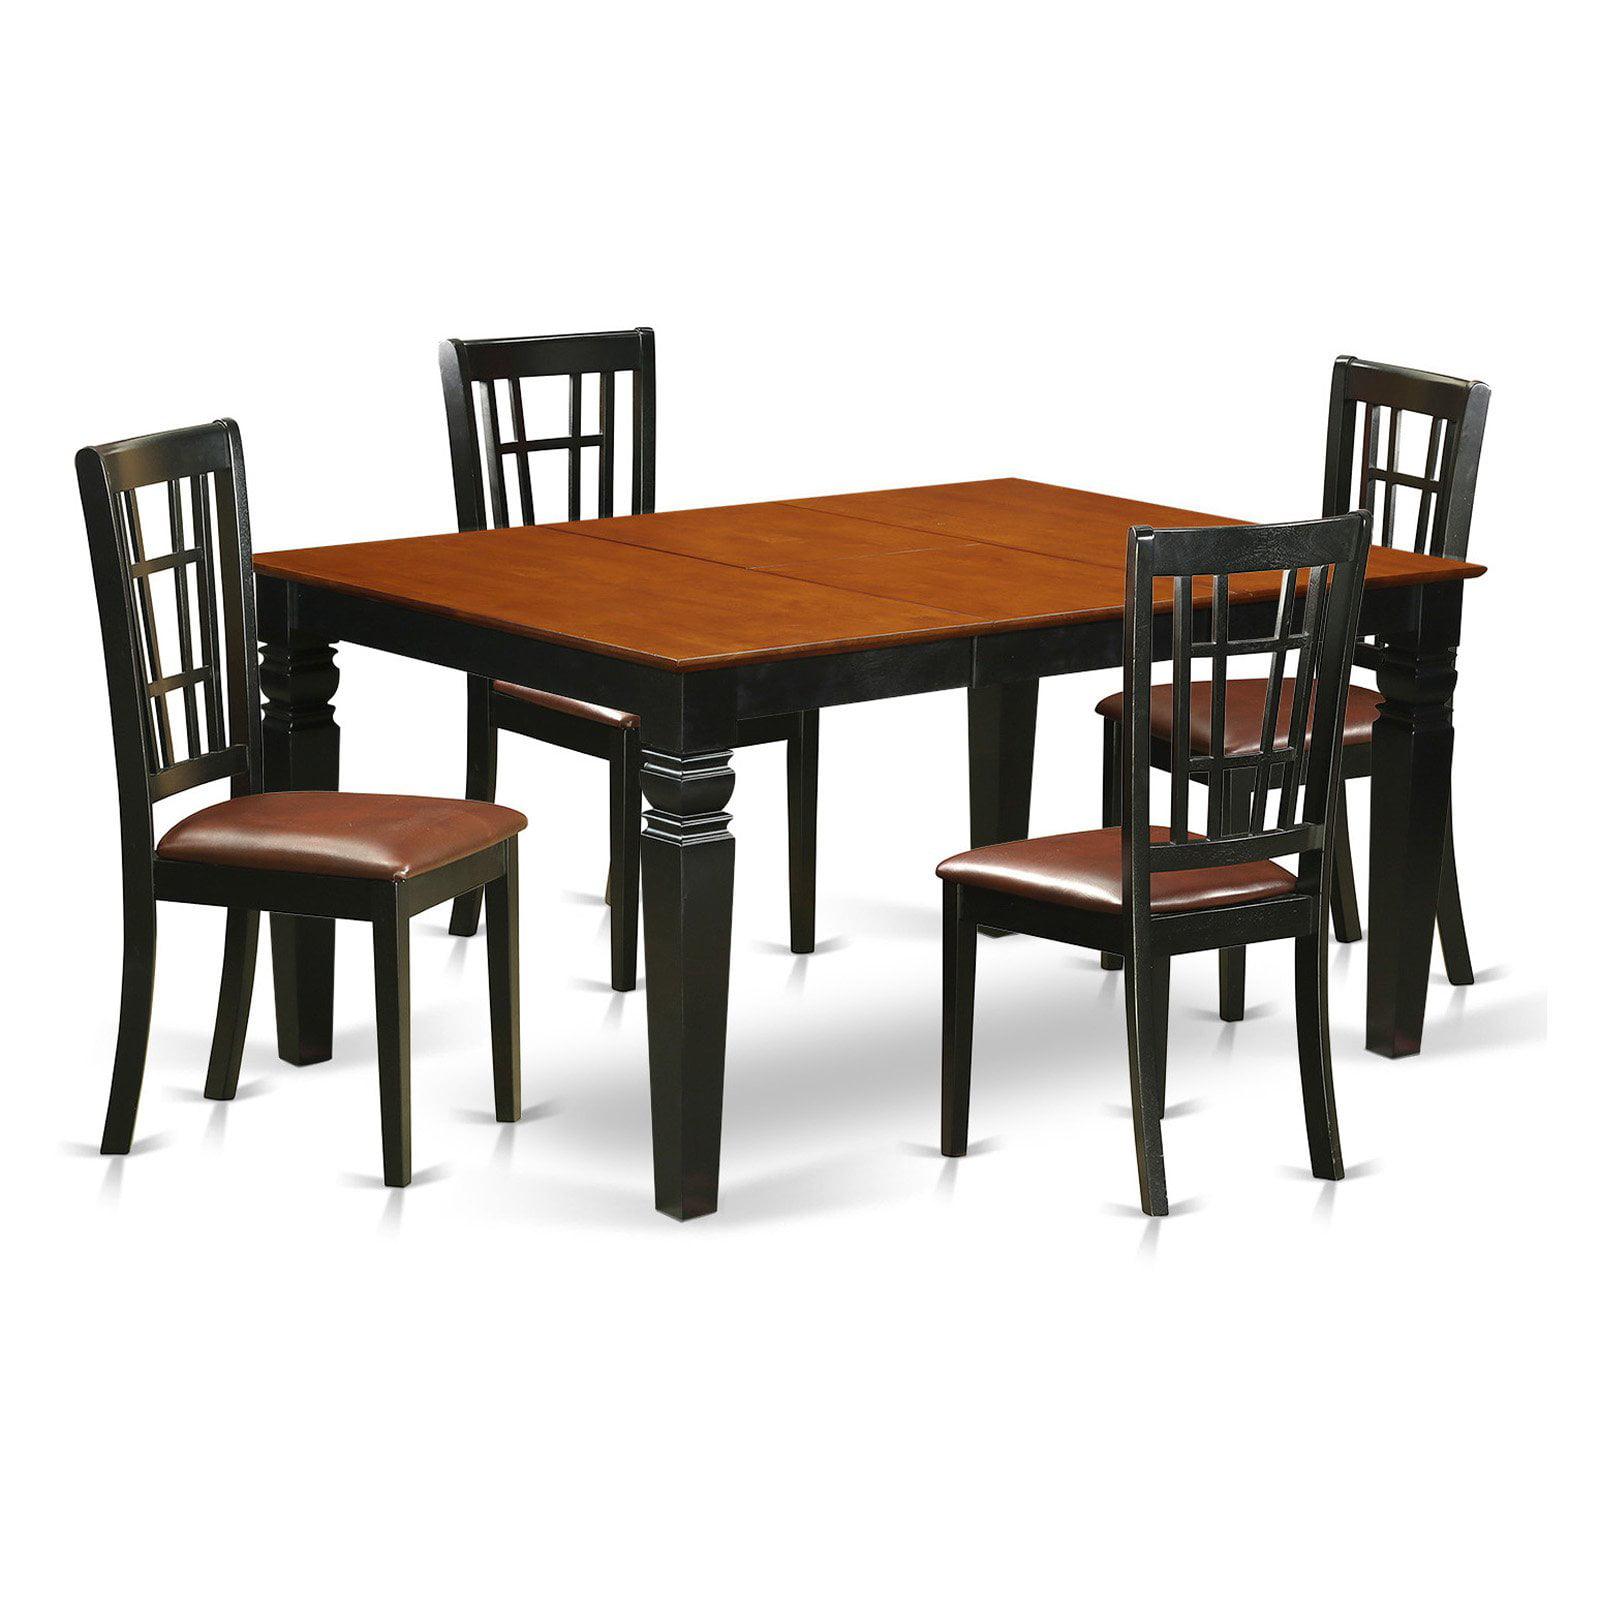 East West Furniture Weston 5 Piece Windowpane Dining Table Set